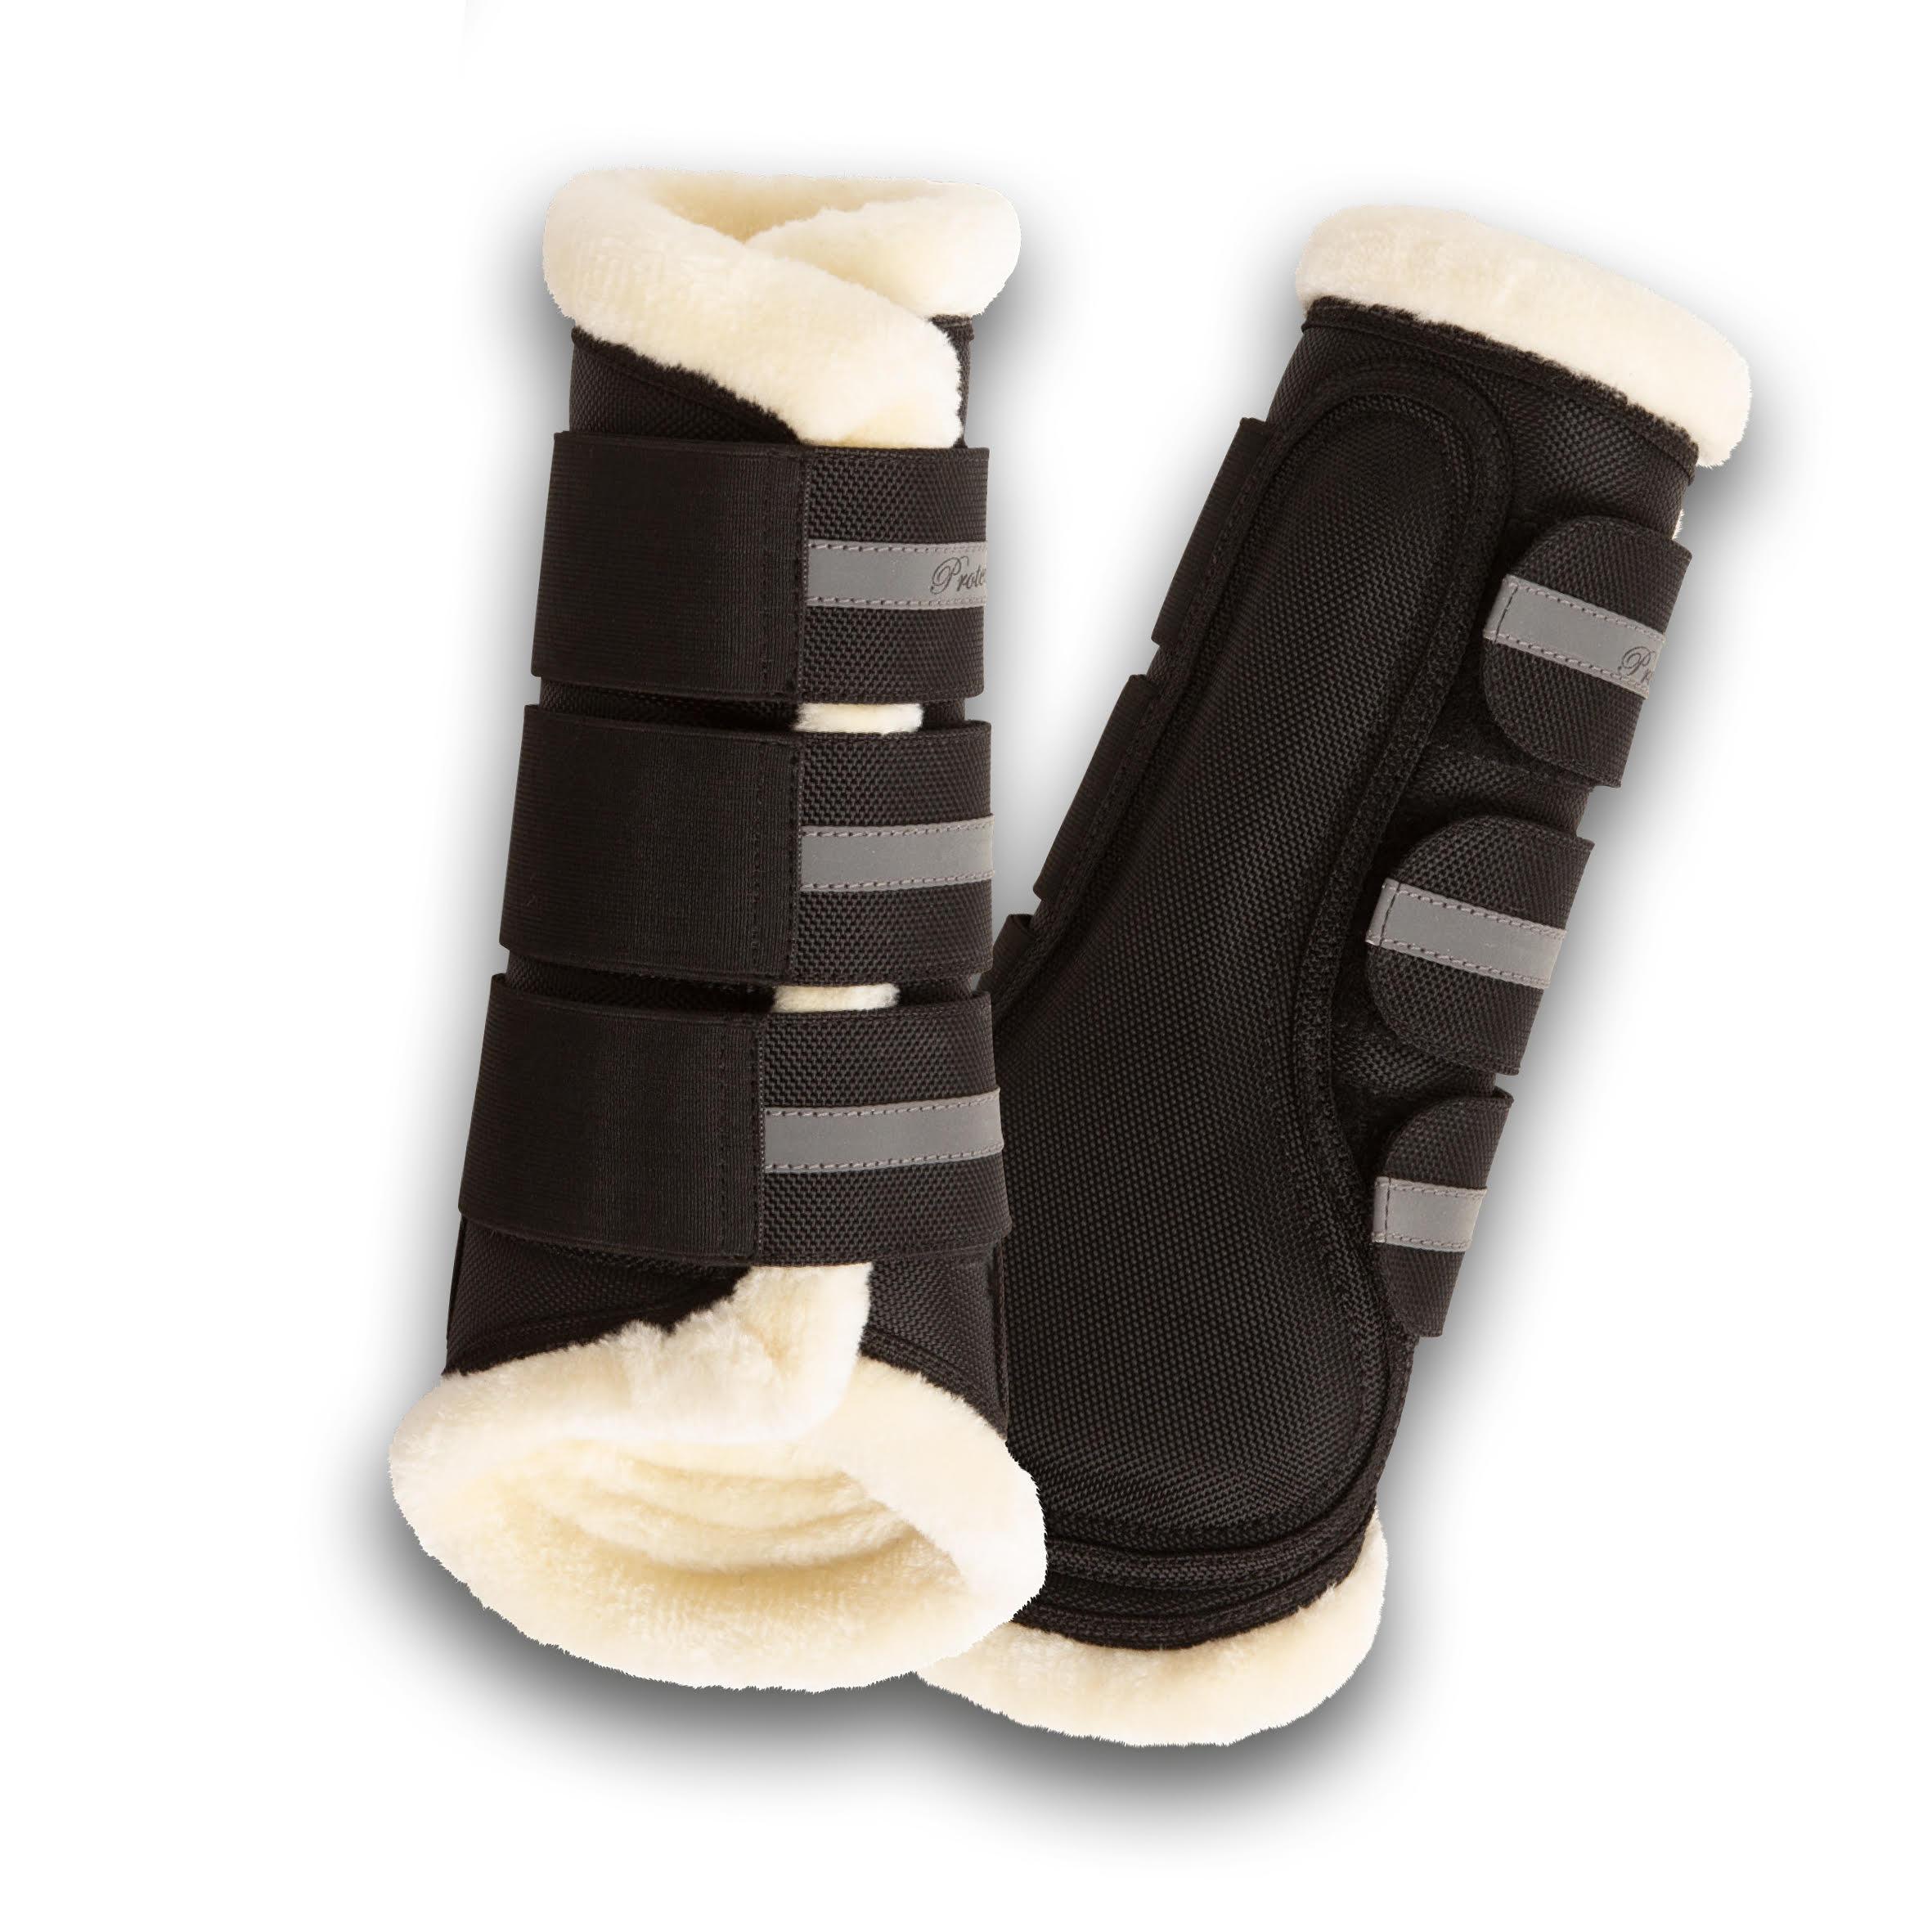 Cordura Brushing Boot - Black